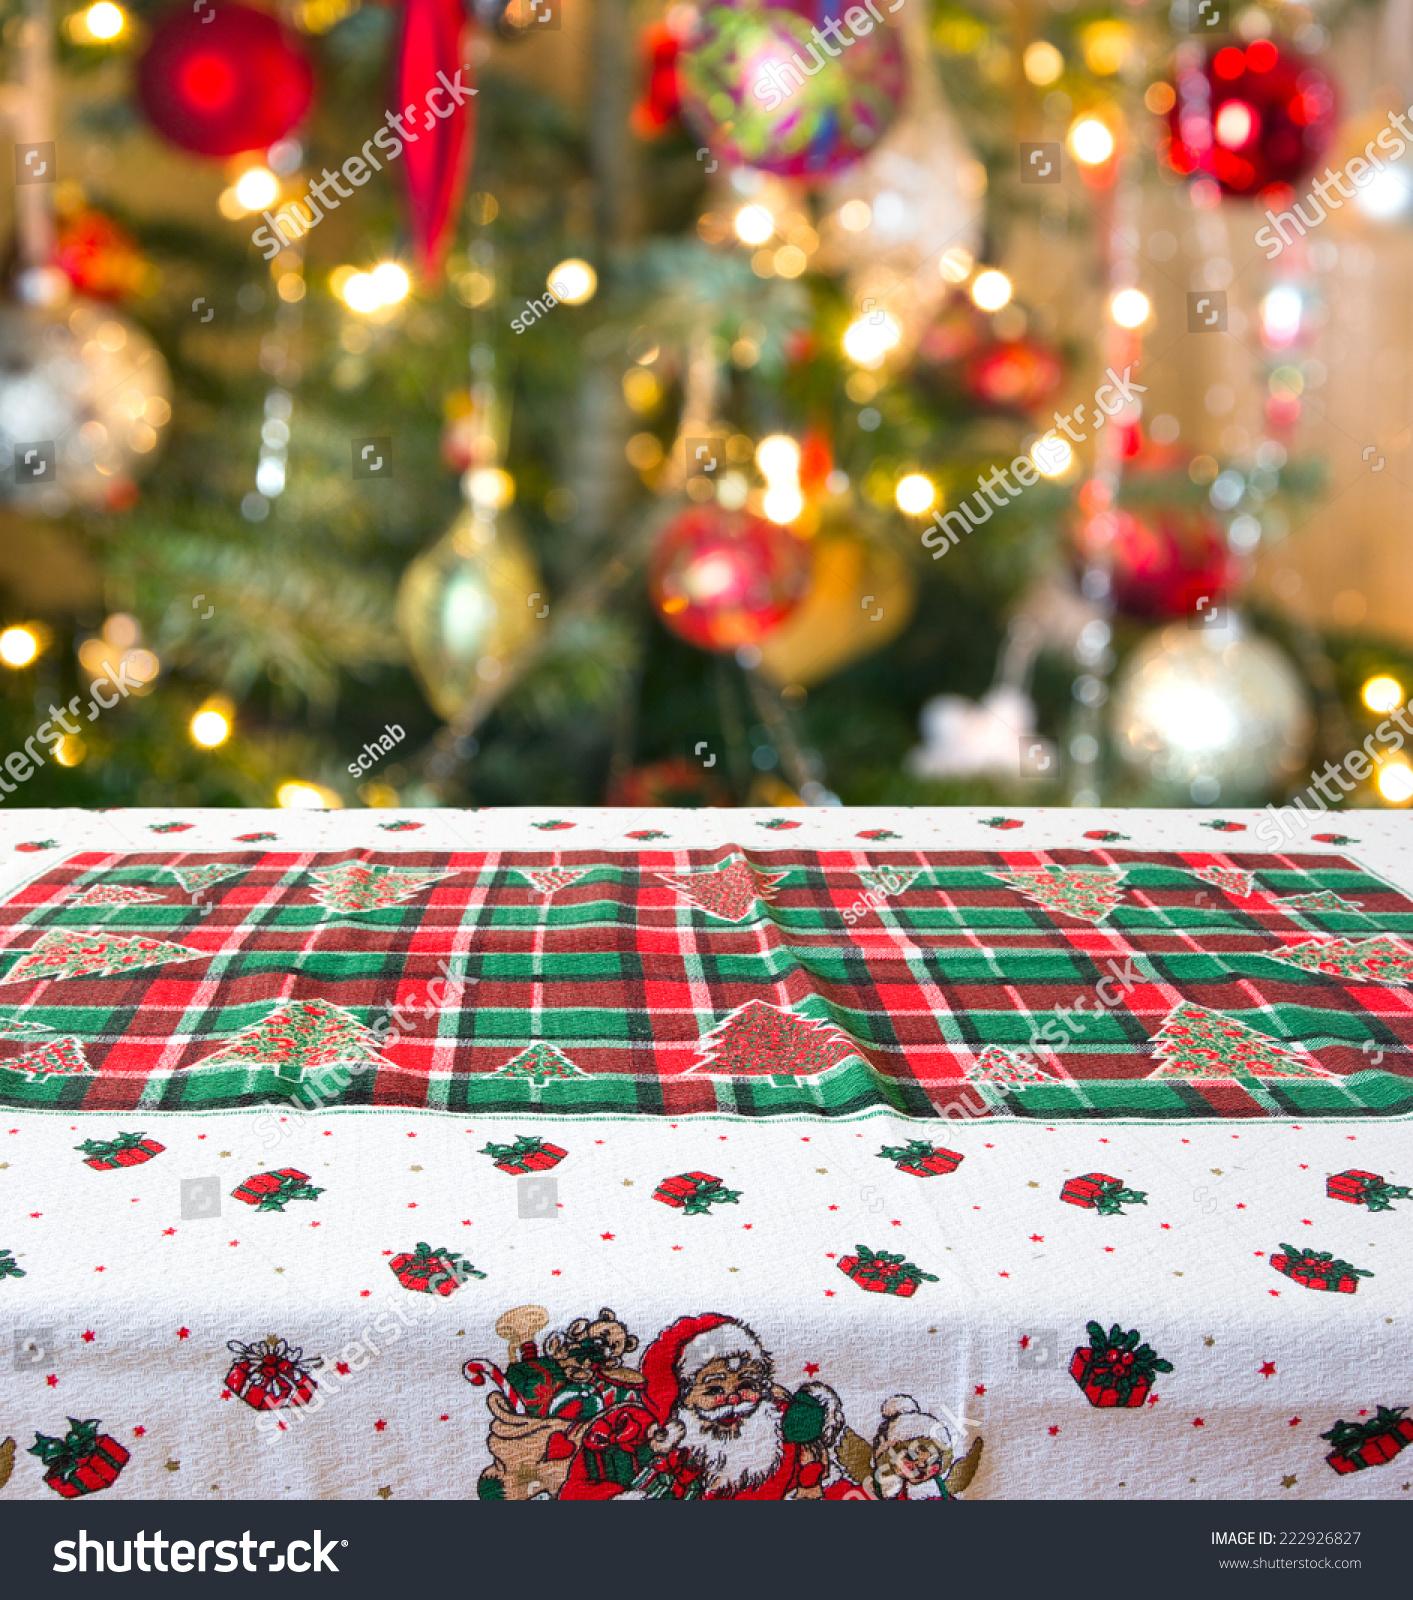 Table Christmas Tree With Lights